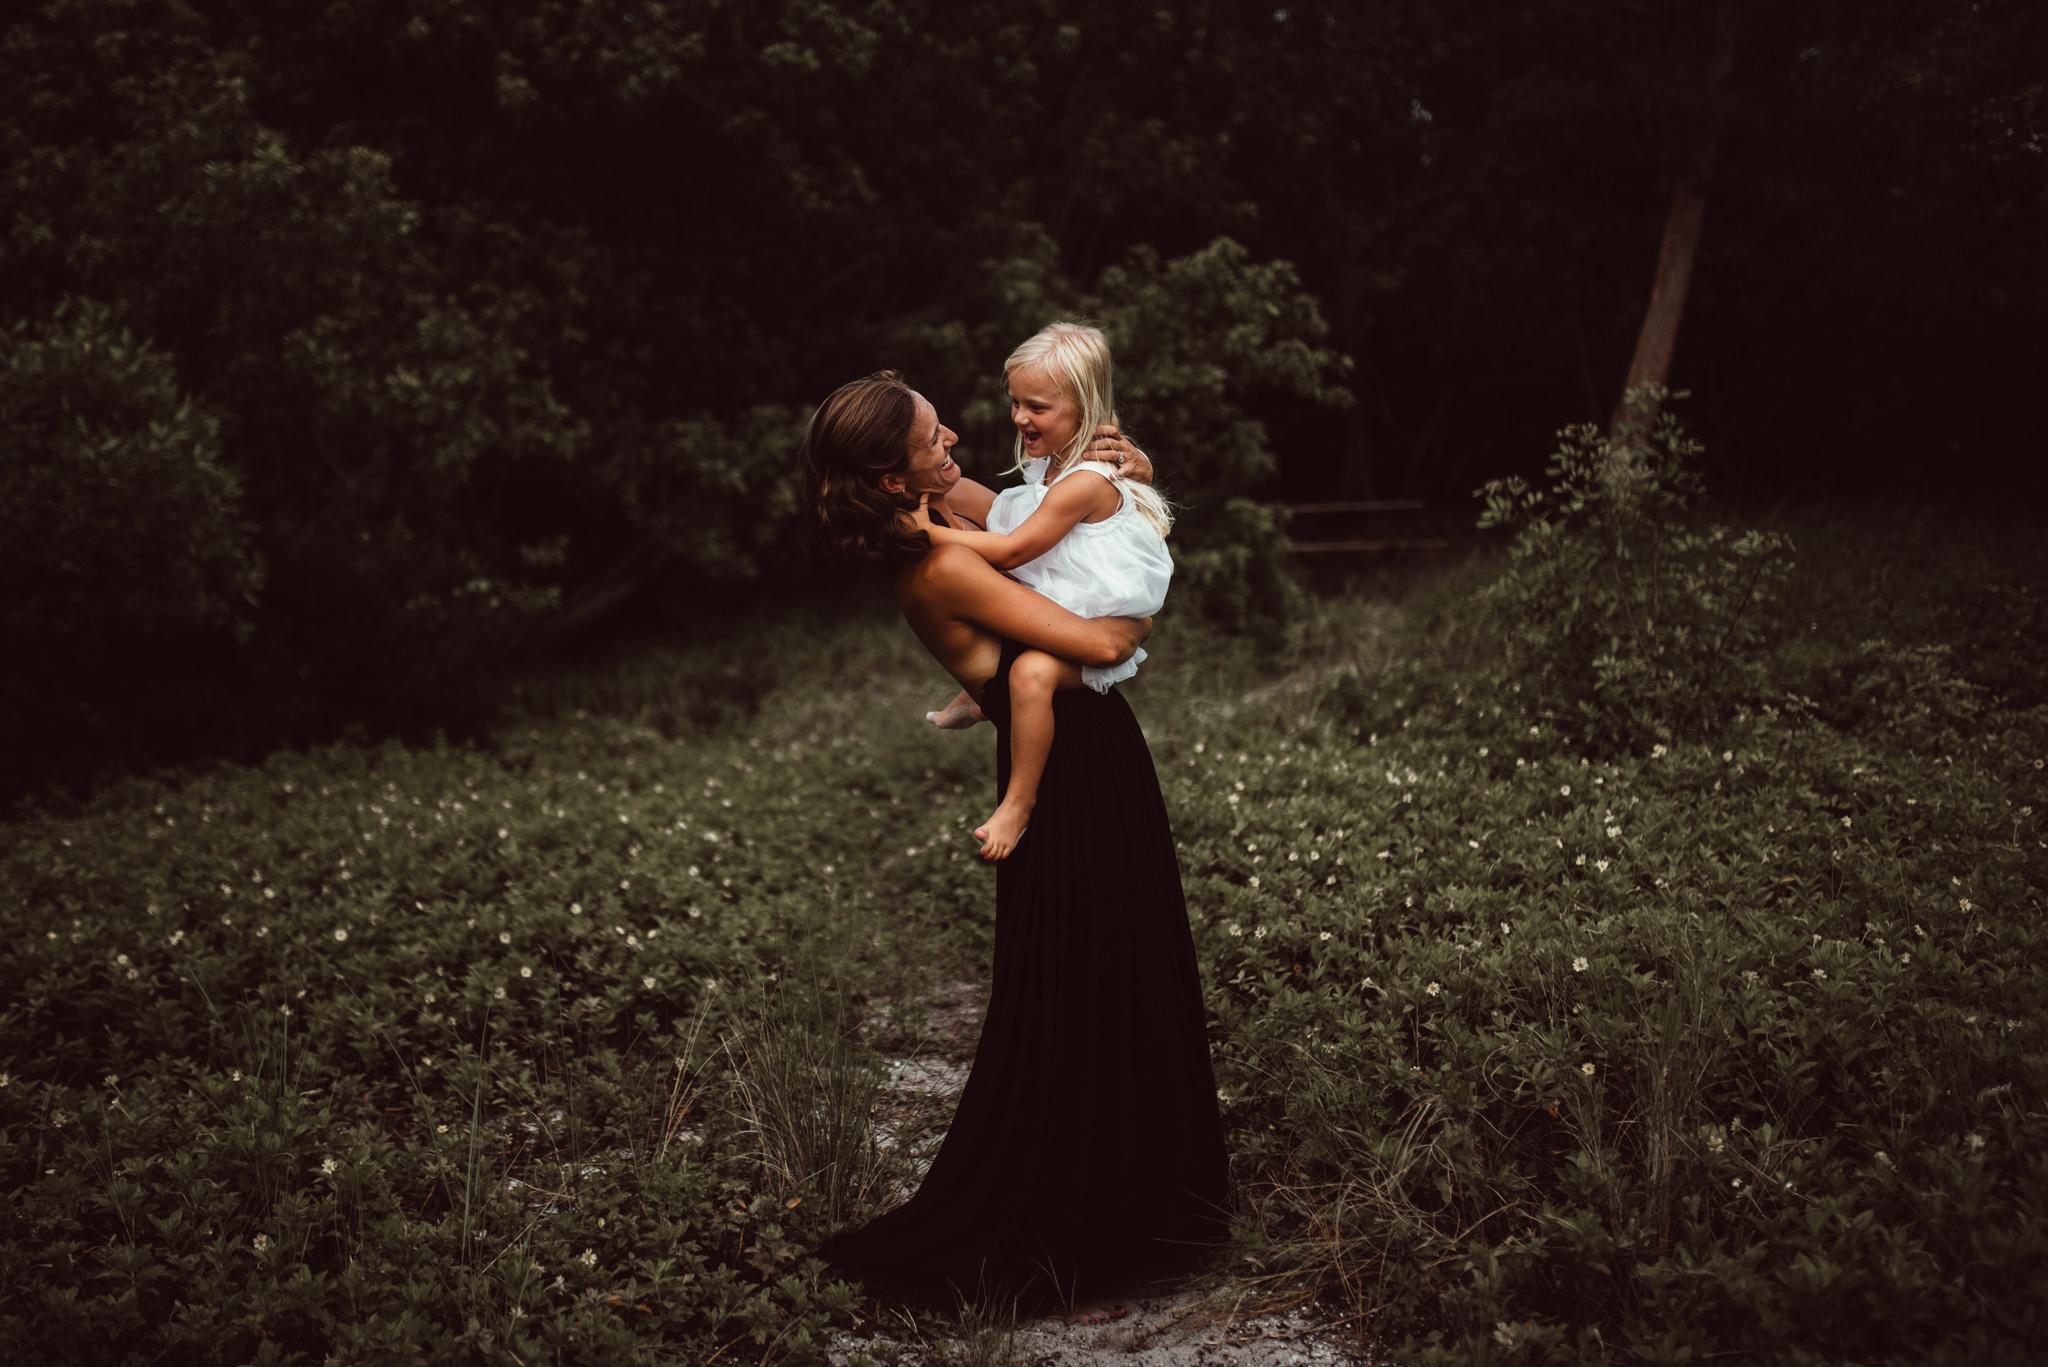 twyla jones photography - treasure coast florida - island family session-5005.jpg